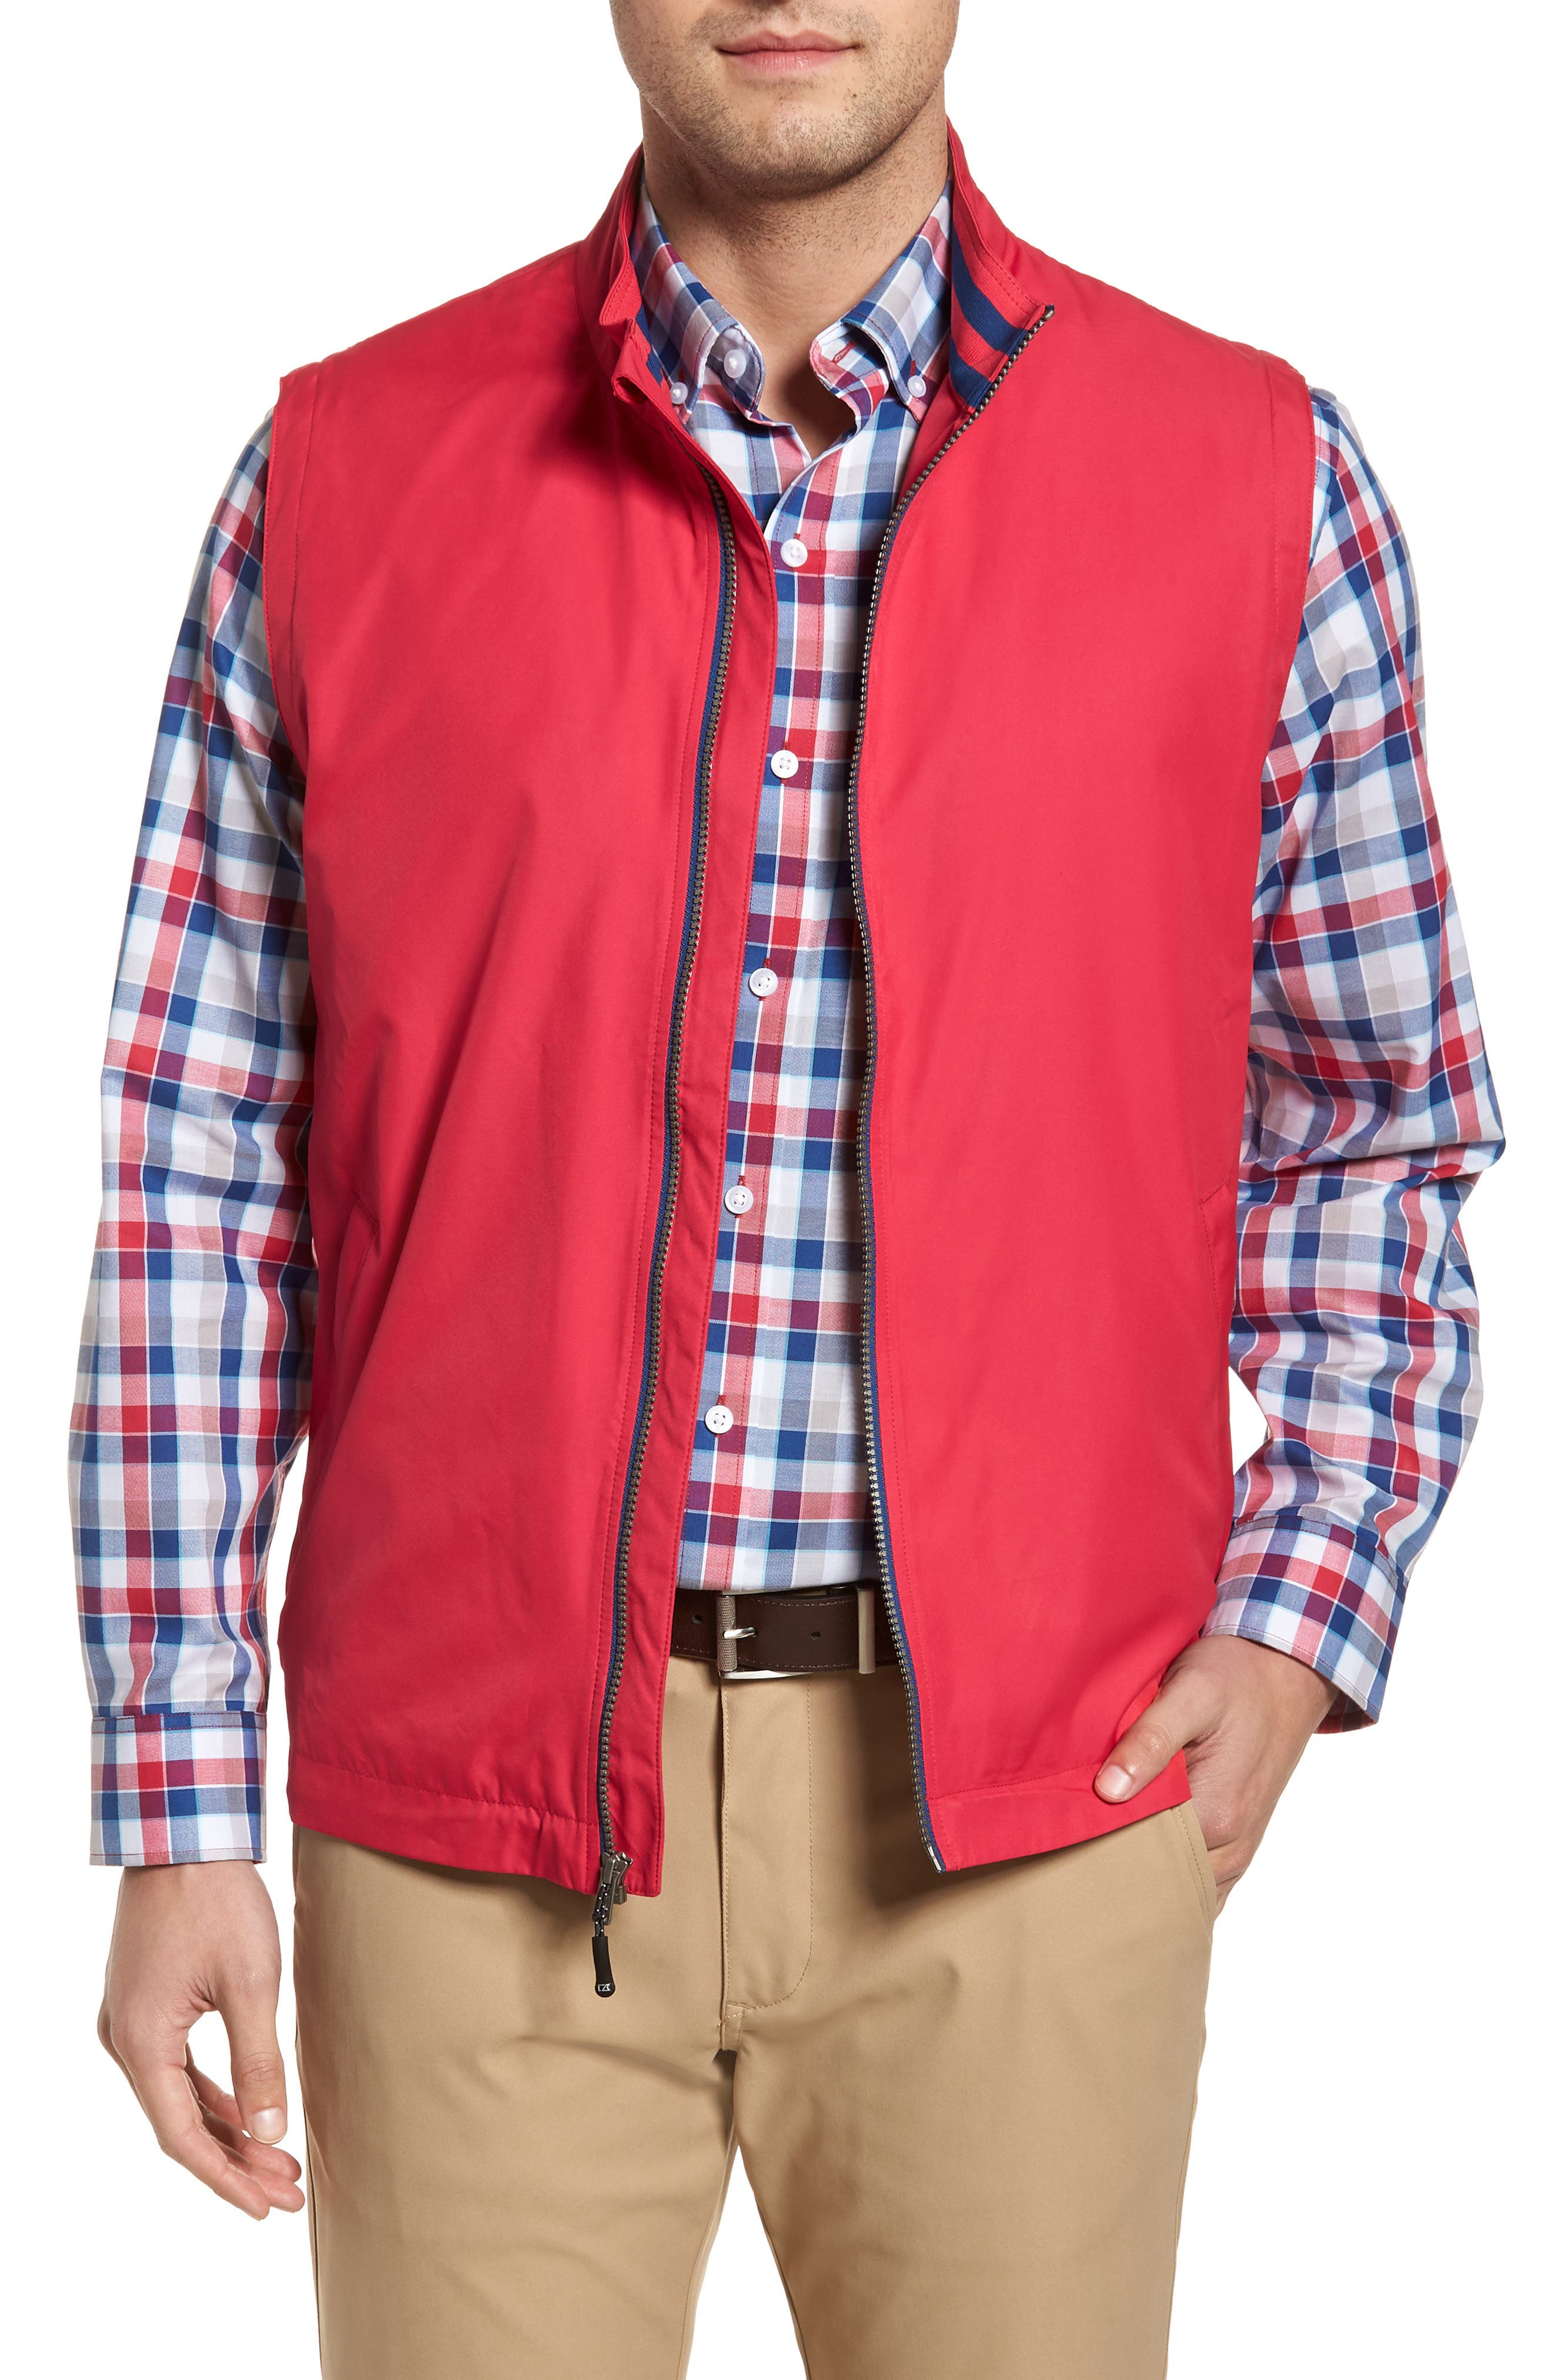 Nine Iron DryTec Zip Vest,                         Main,                         color, Virtual